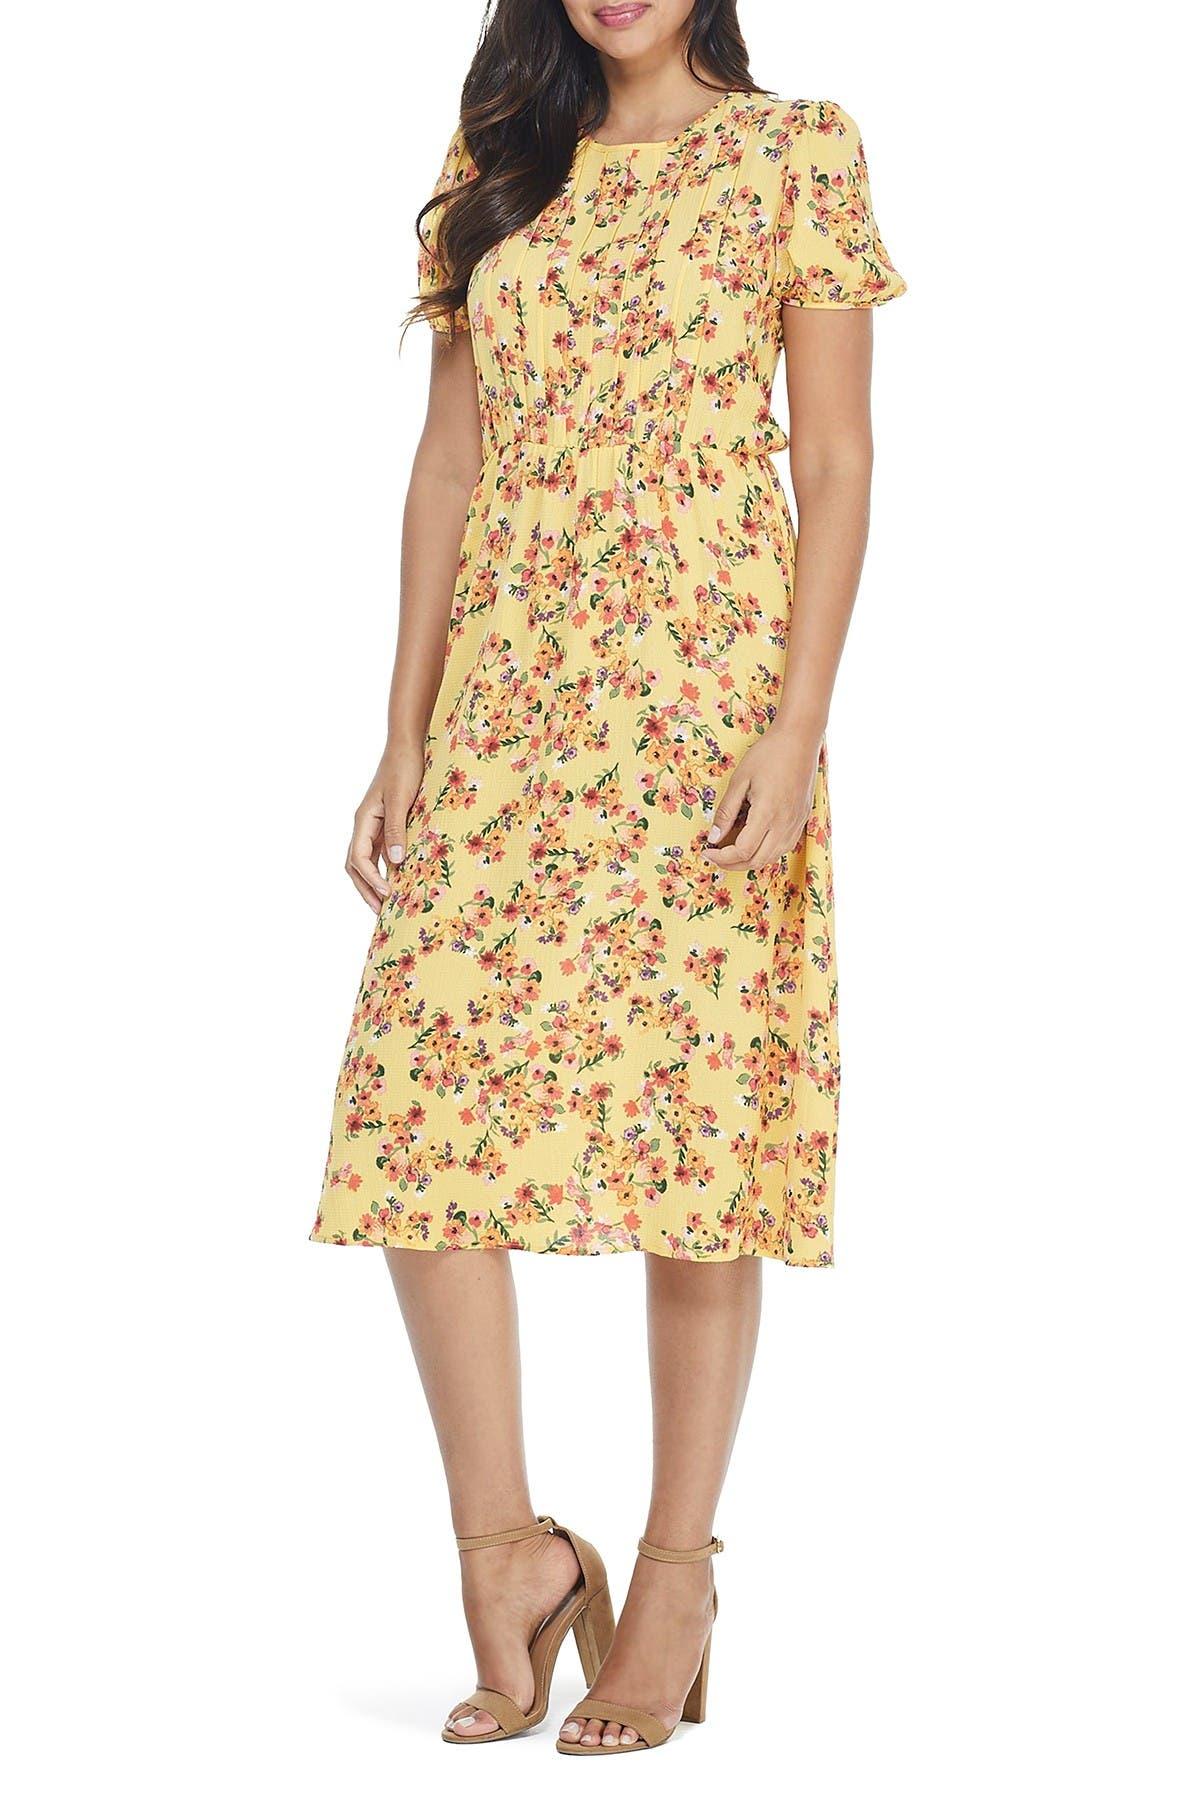 Image of London Times Puff Sleeve Patterned Midi Dress